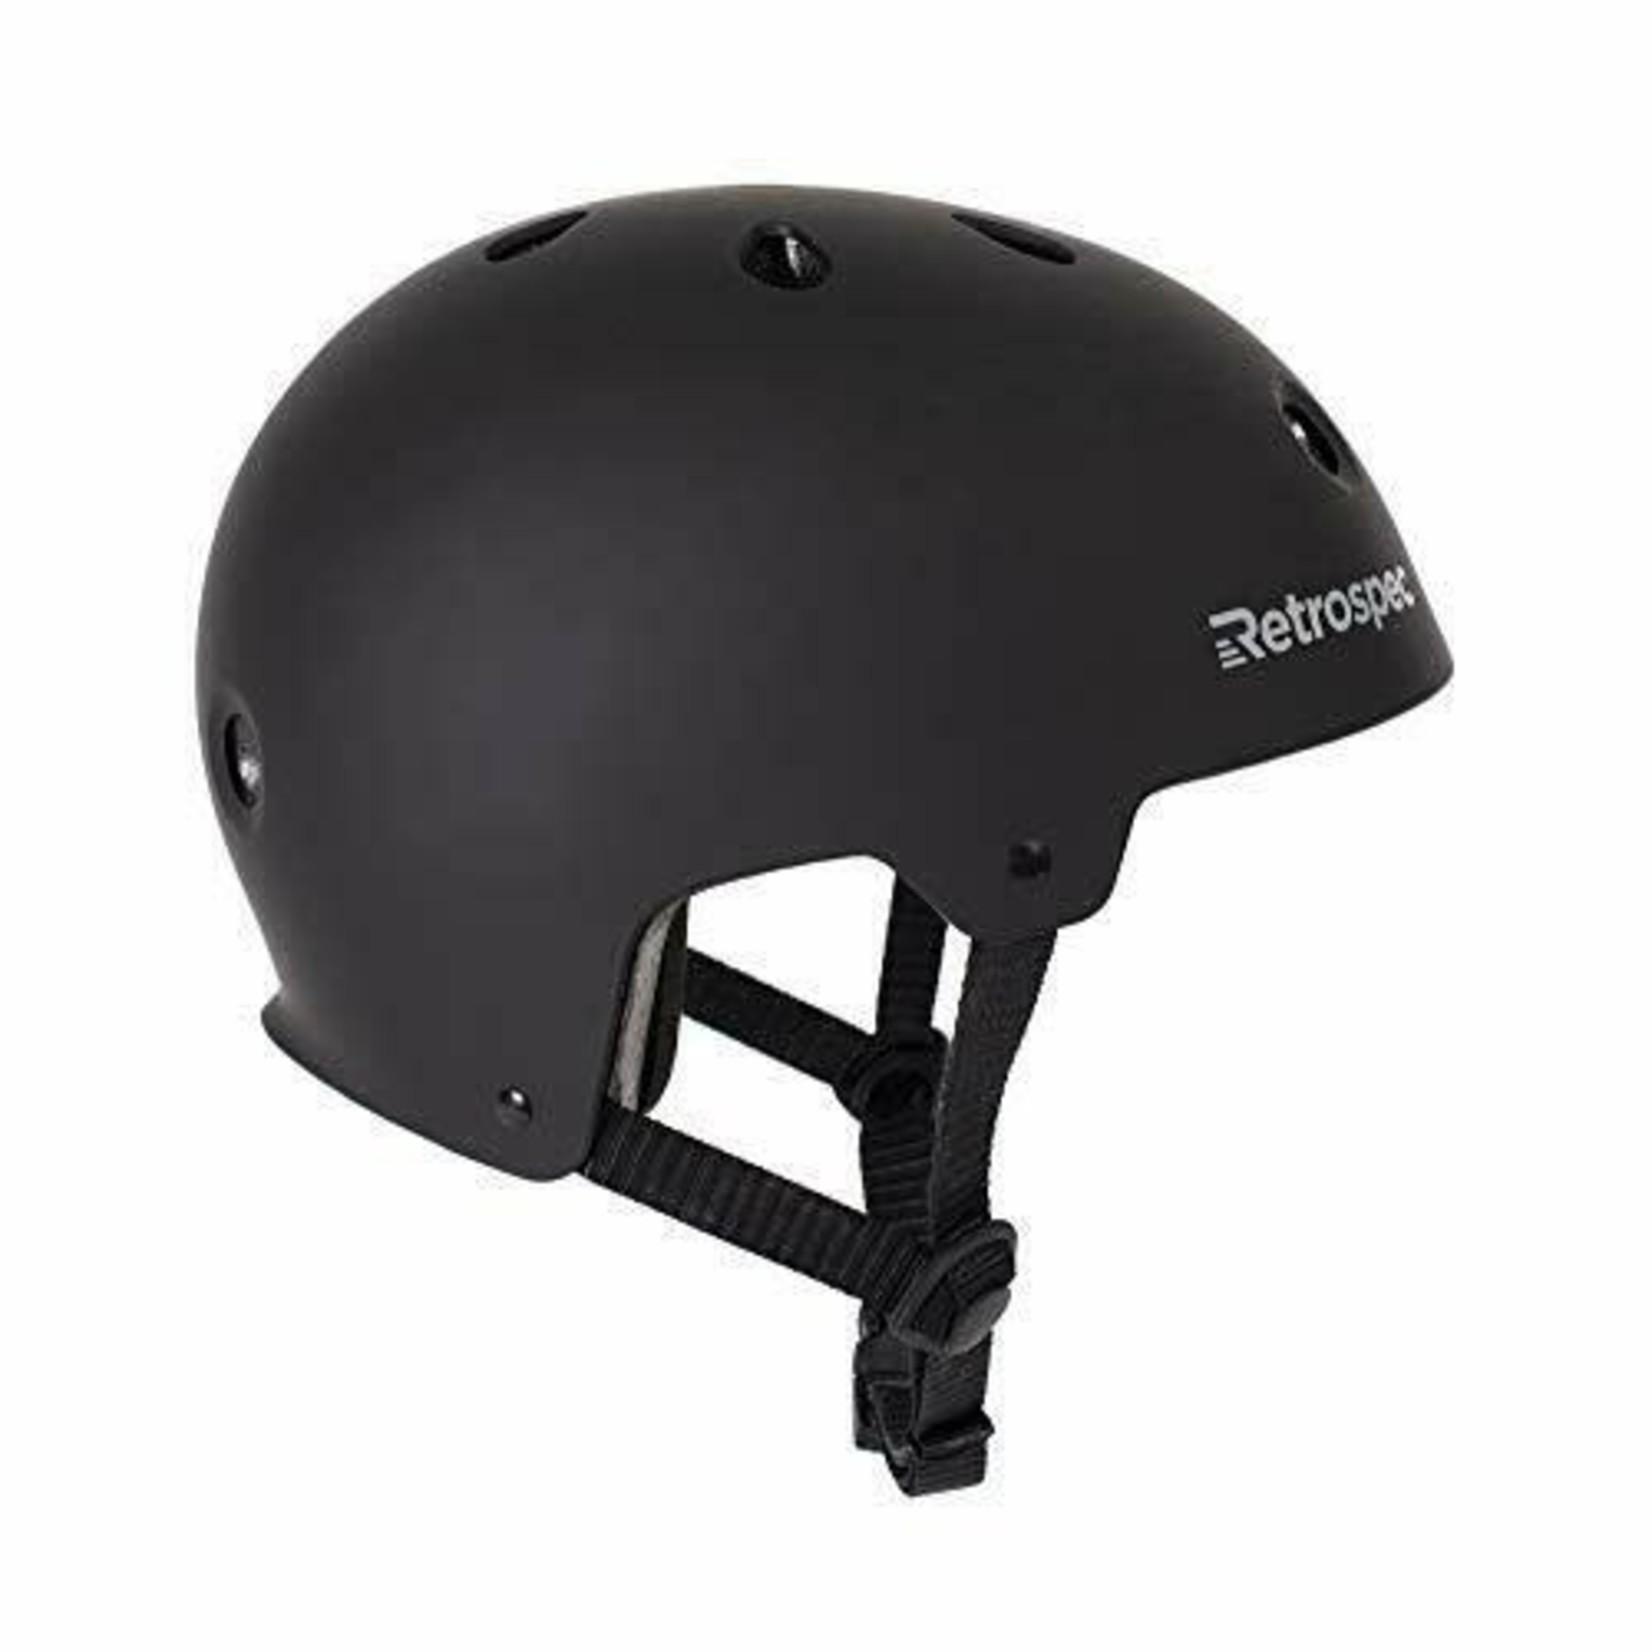 Retrospec Retrospec CM-2 Bike & Skate Helmet - all colors